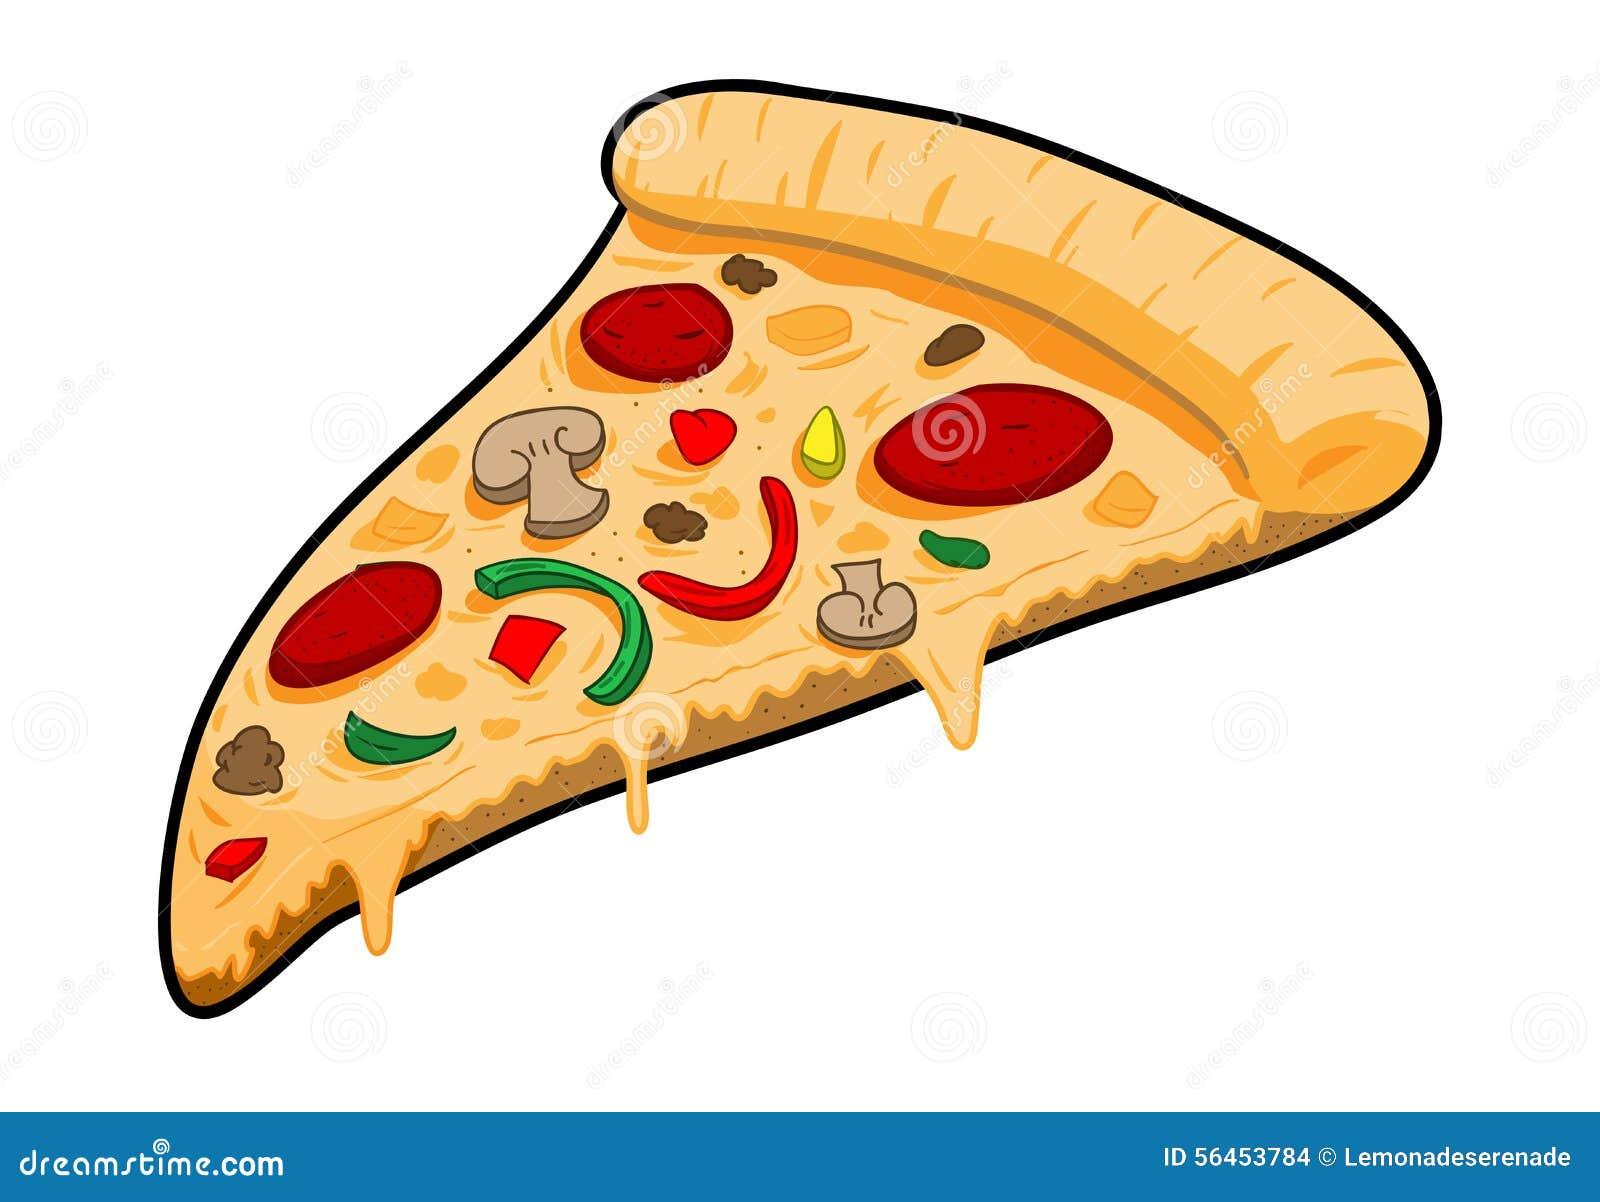 a slice of pizza stock vector image 56453784 pizza slice clipart clipart cheese pizza slice